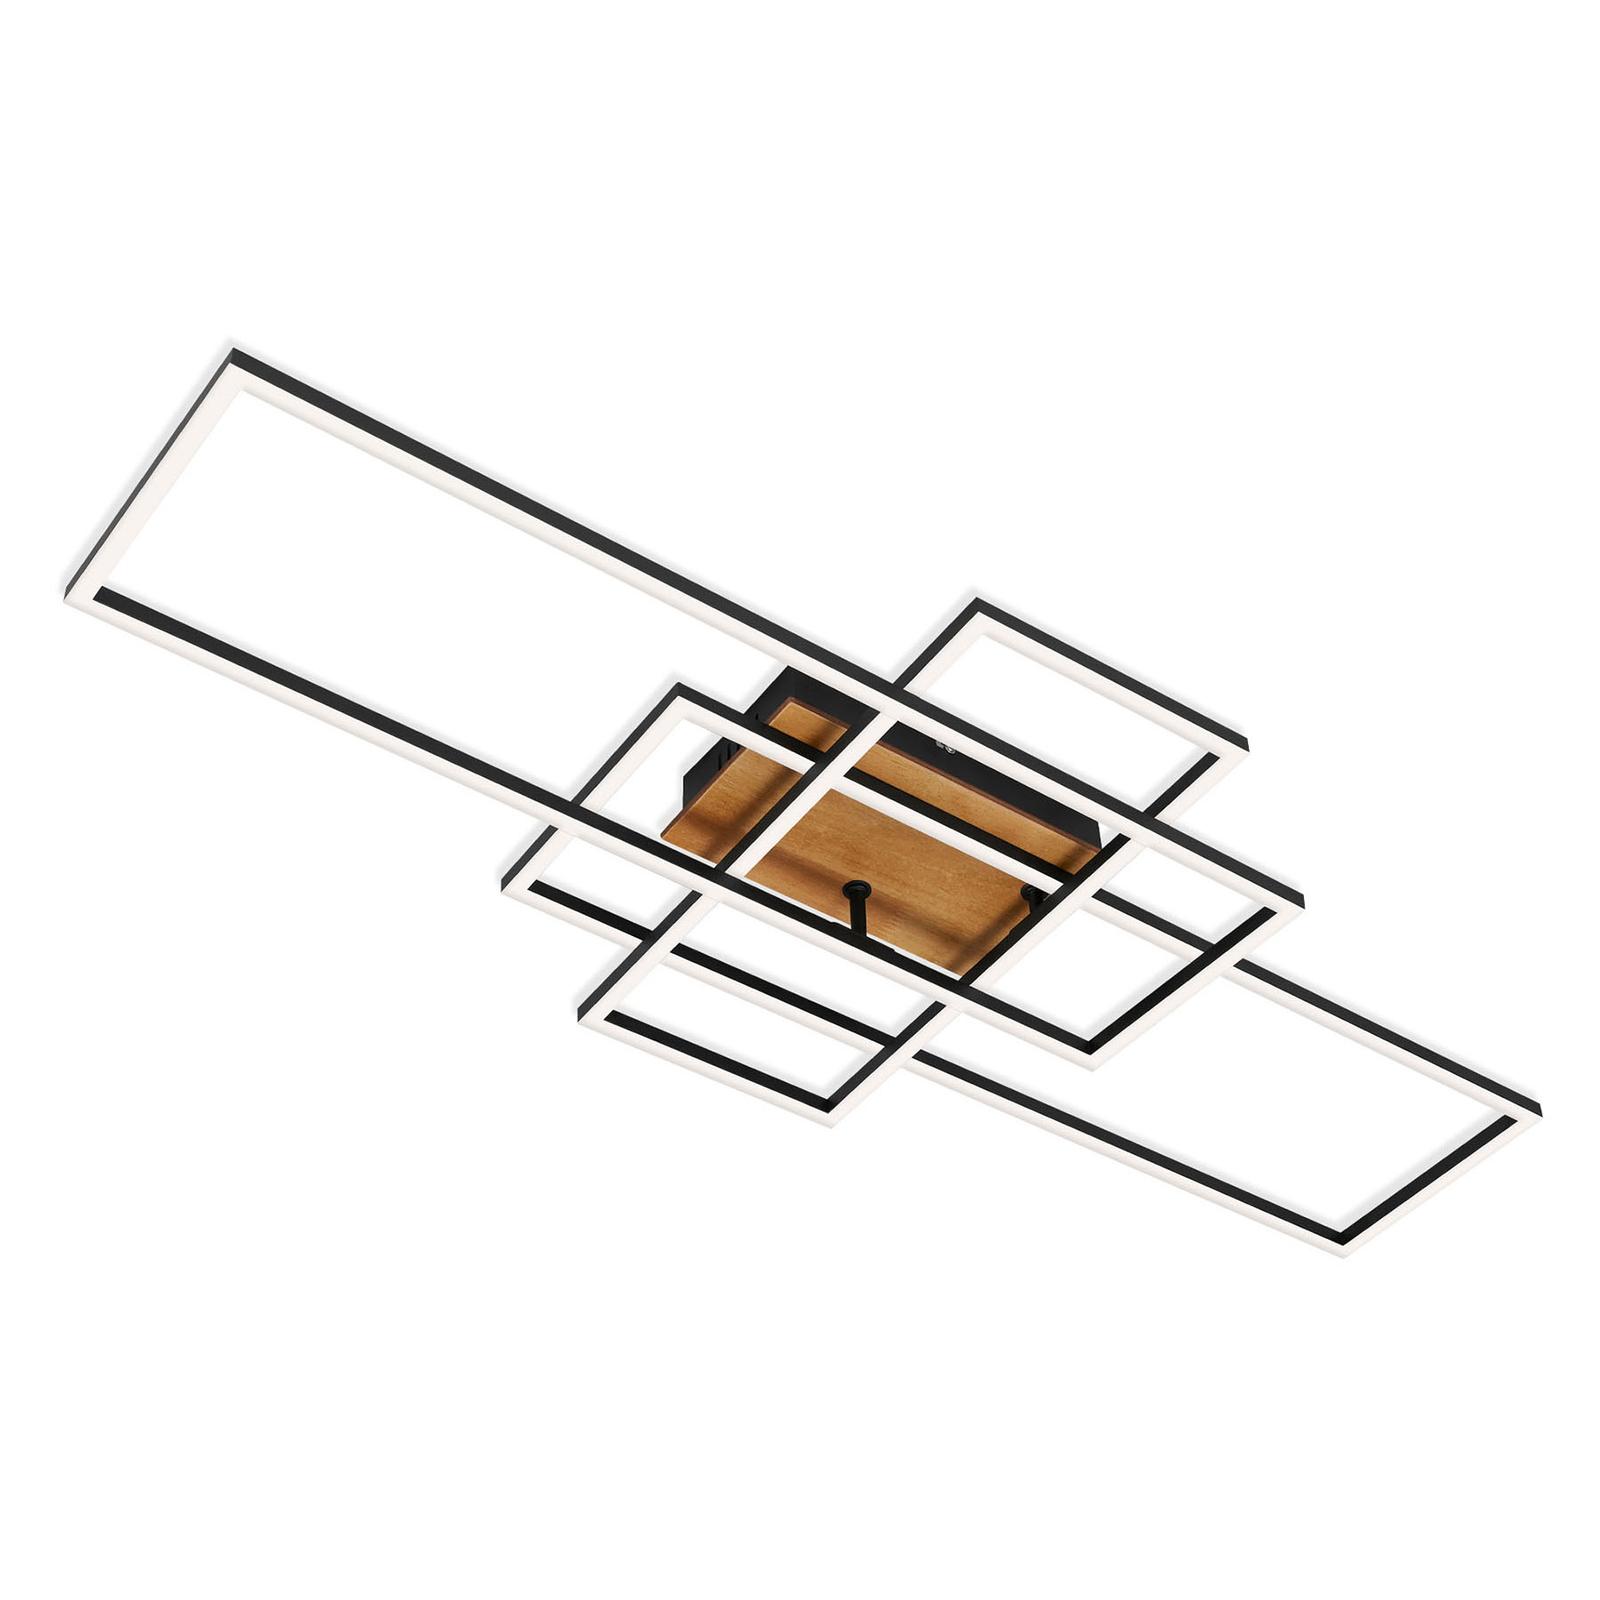 Plafonnier Frame CCT, télécommande, noir/bois